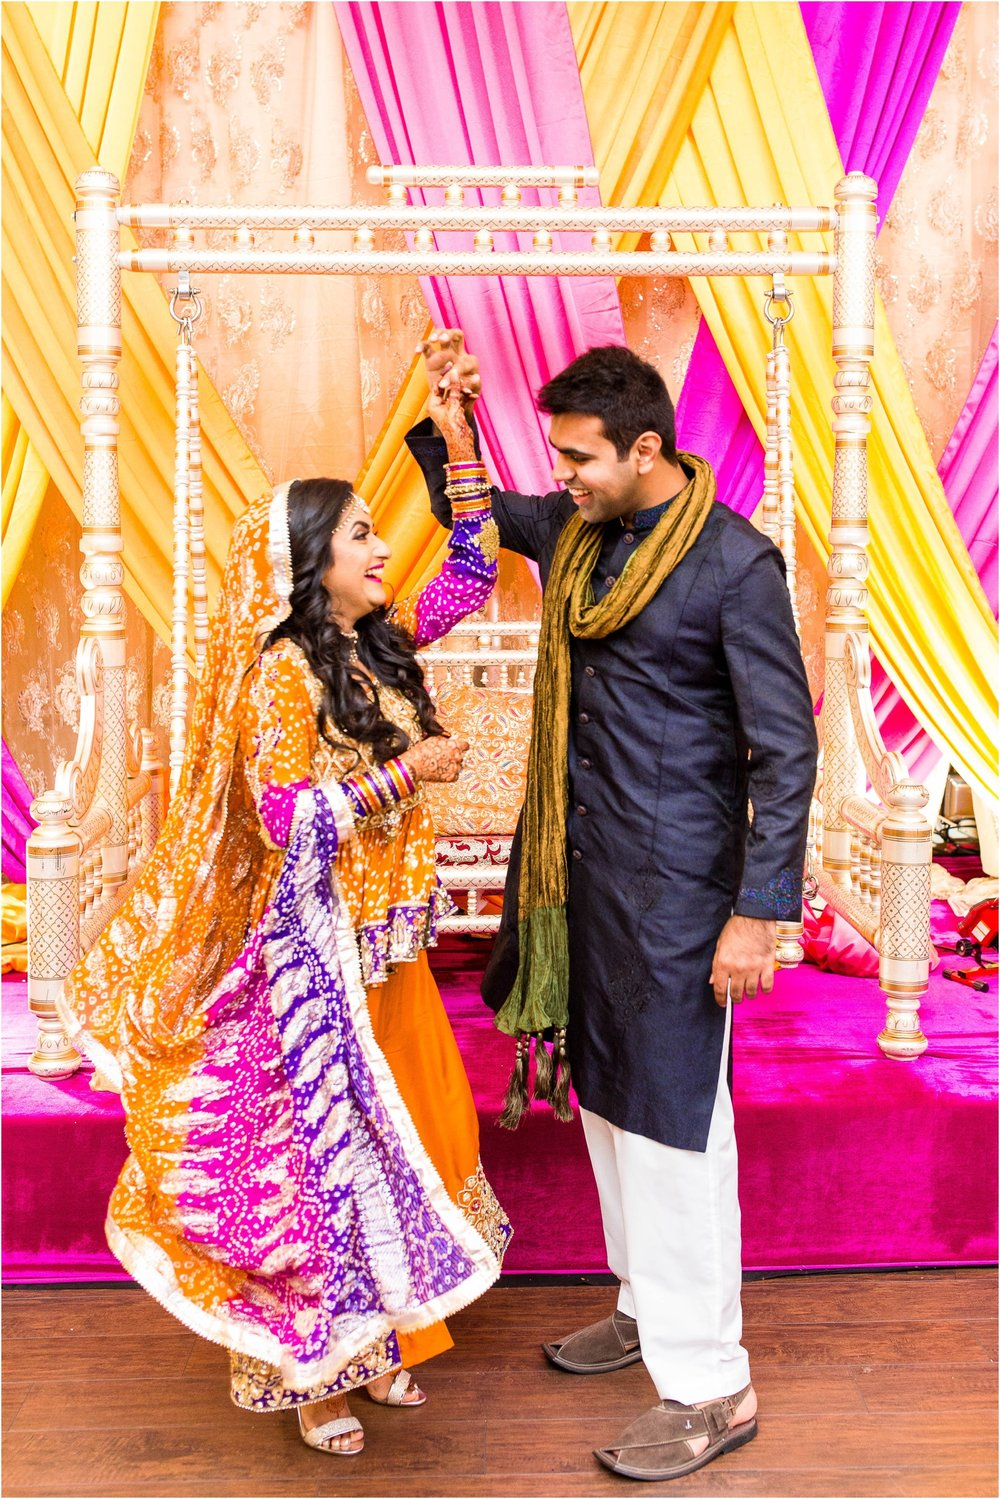 Best-of-2017-Weddings-Toronto-Mississauga-Brampton-Scarborough-GTA-Pakistani-Indian-Wedding-Engagement-Photographer-Photography_0126.jpg